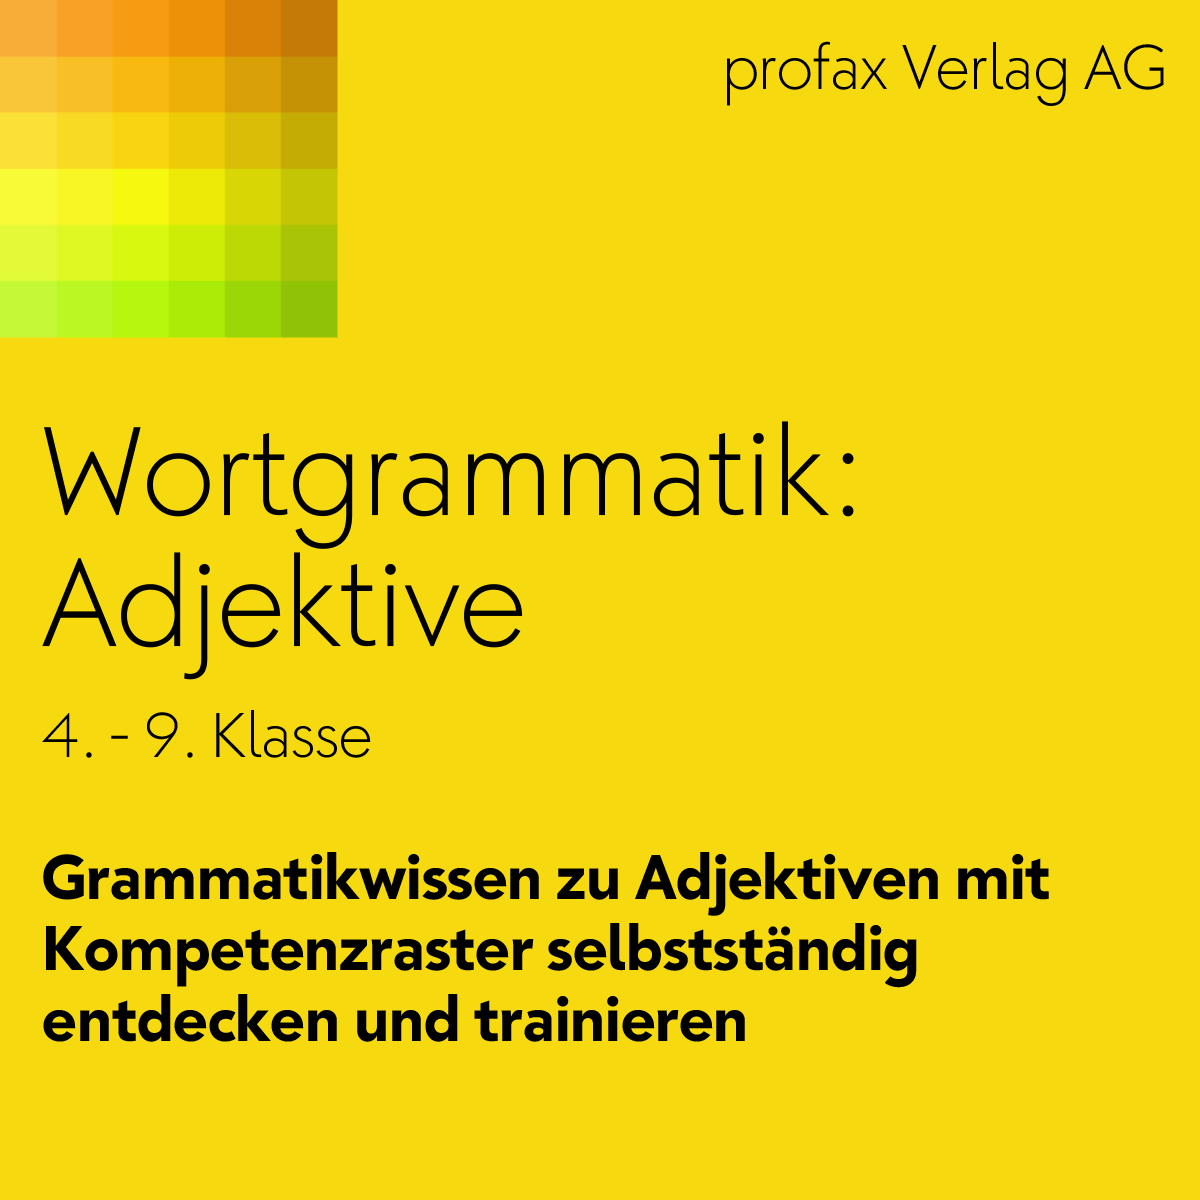 Wortgrammatik: Adjektive